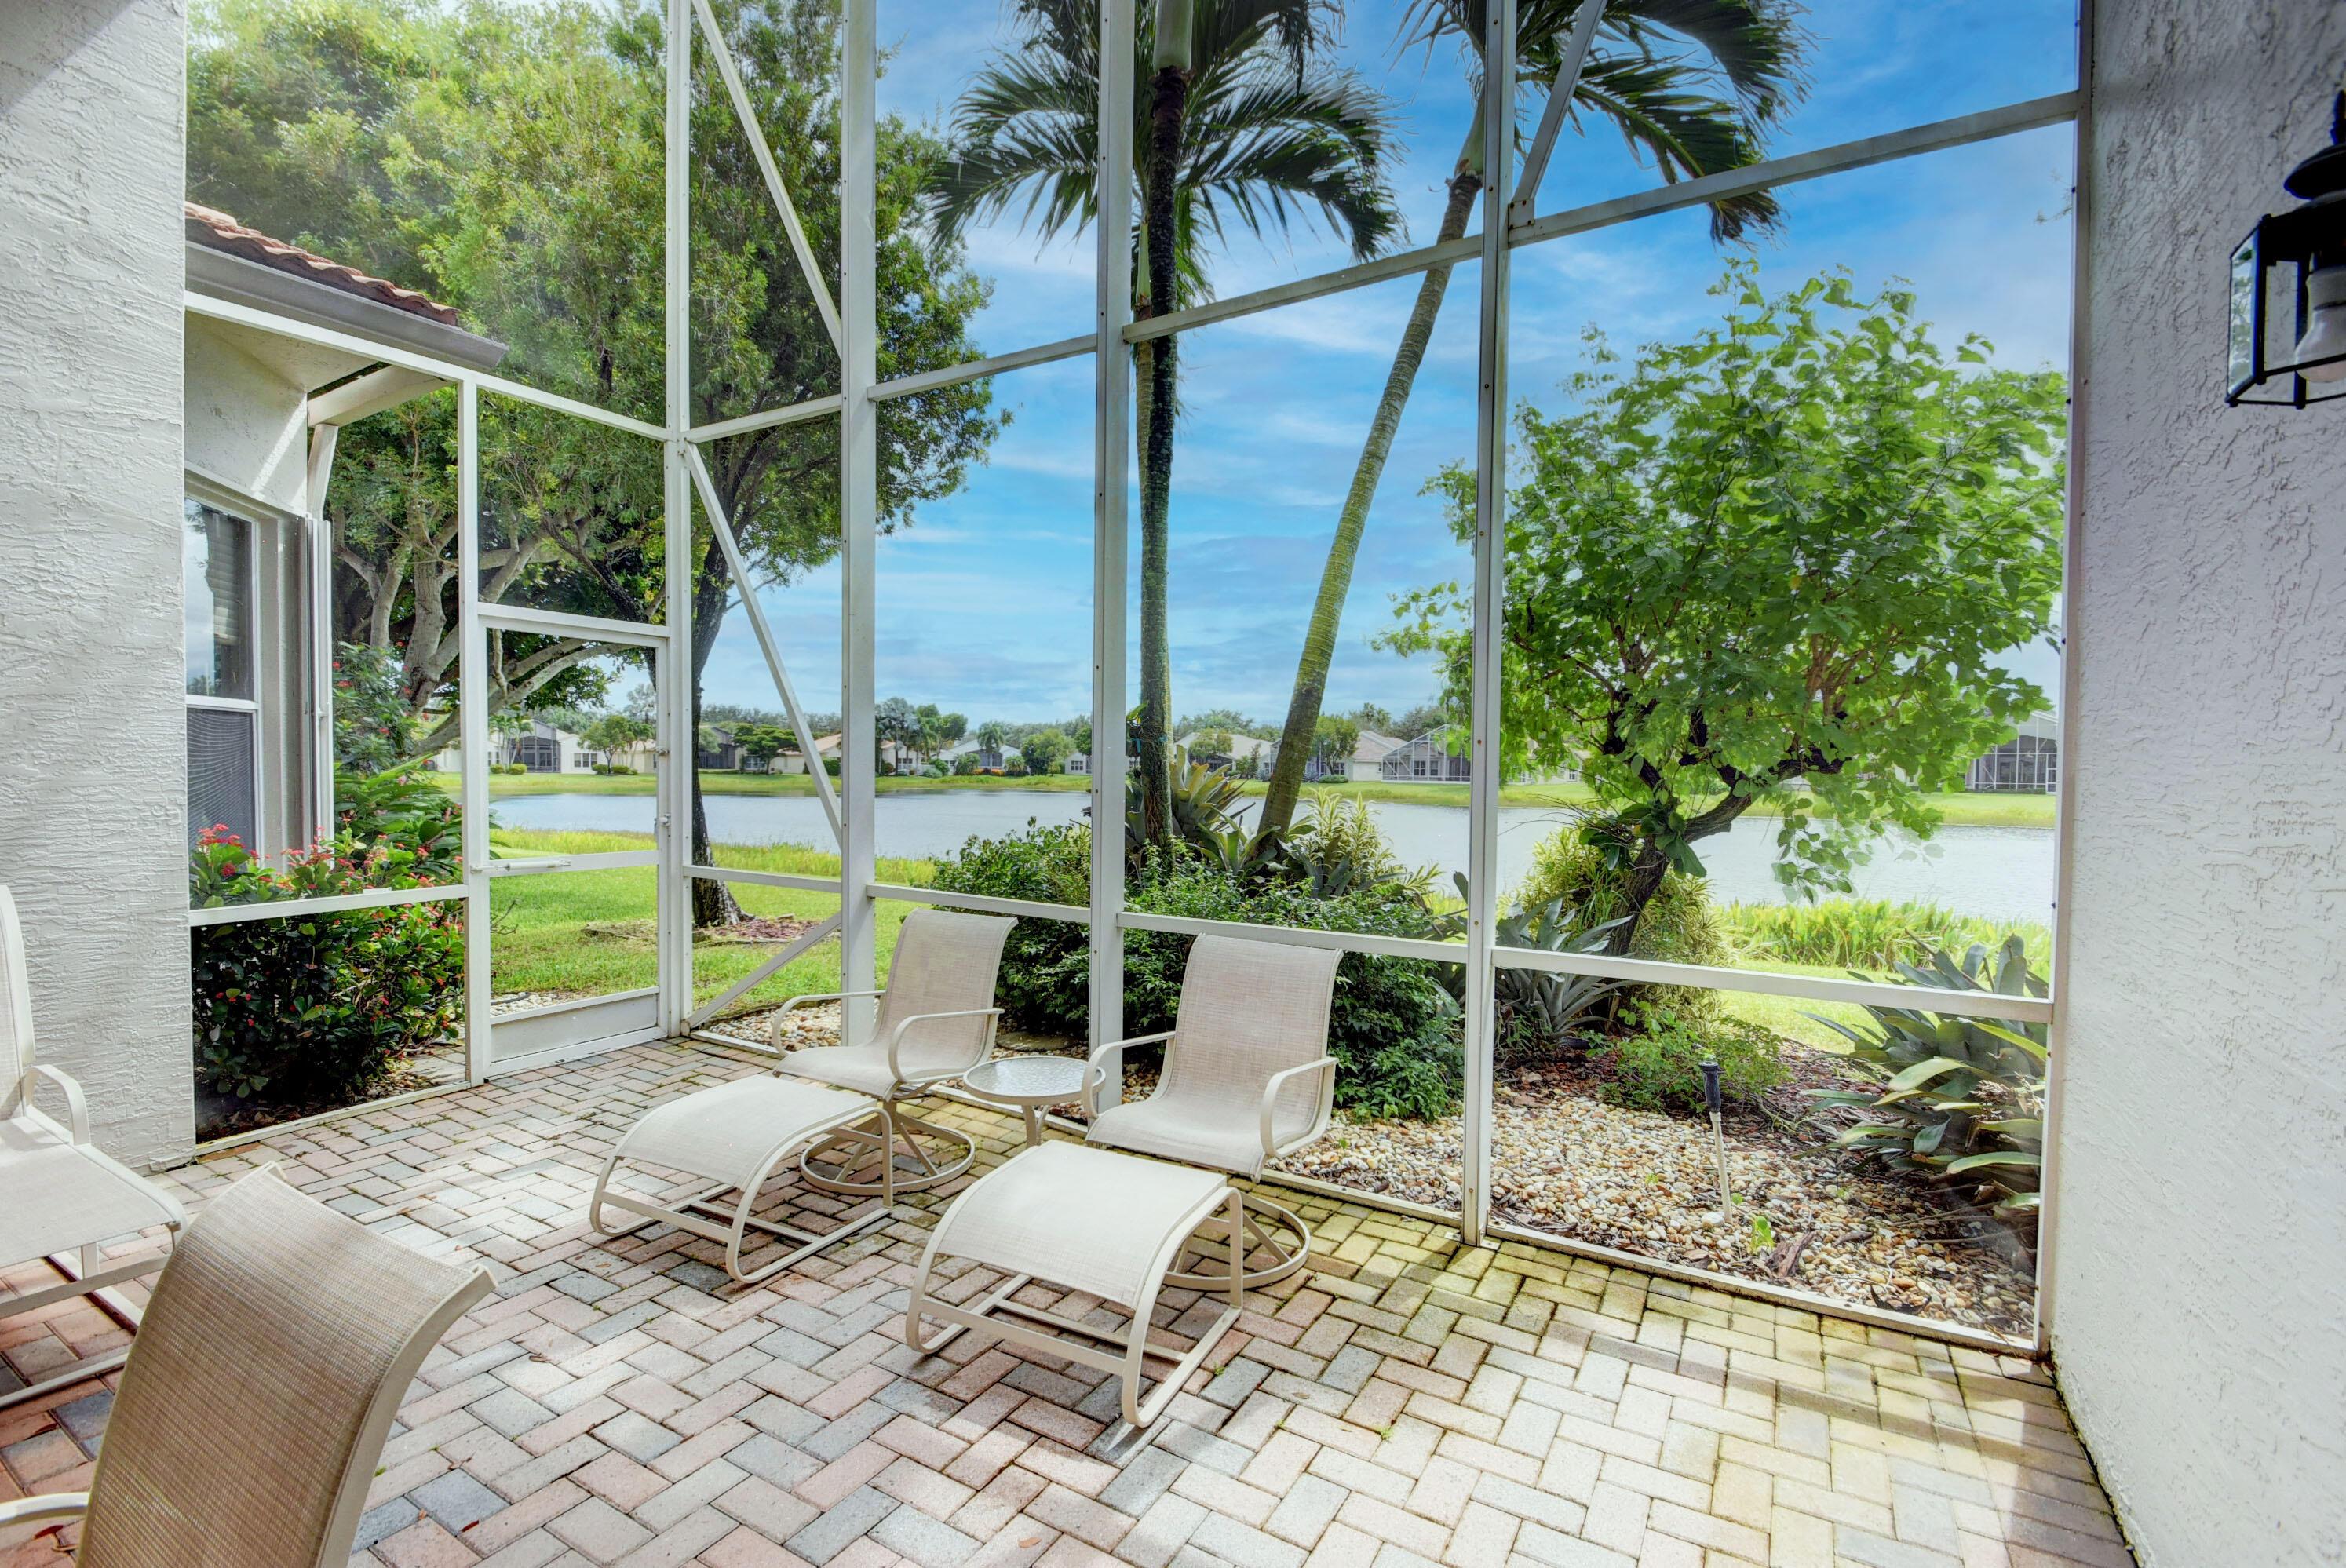 11393 Ohanu Circle Boynton Beach, FL 33437